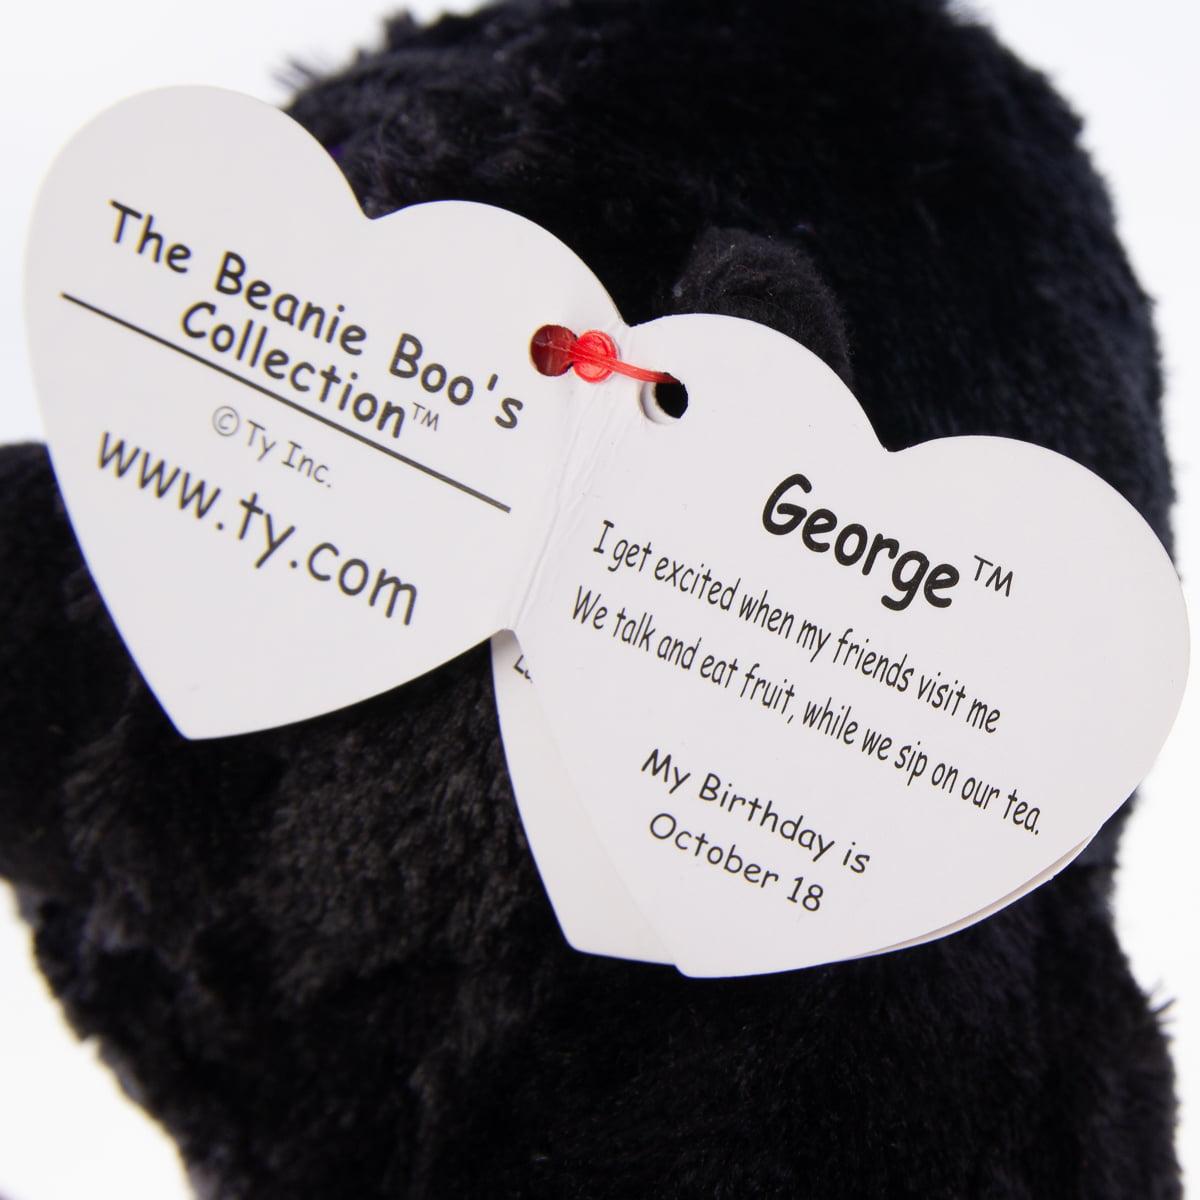 George Gorilla Beanie Boo Small 6 inch - Stuffed Animal by Ty (37222) -  Walmart.com dfe671551b8